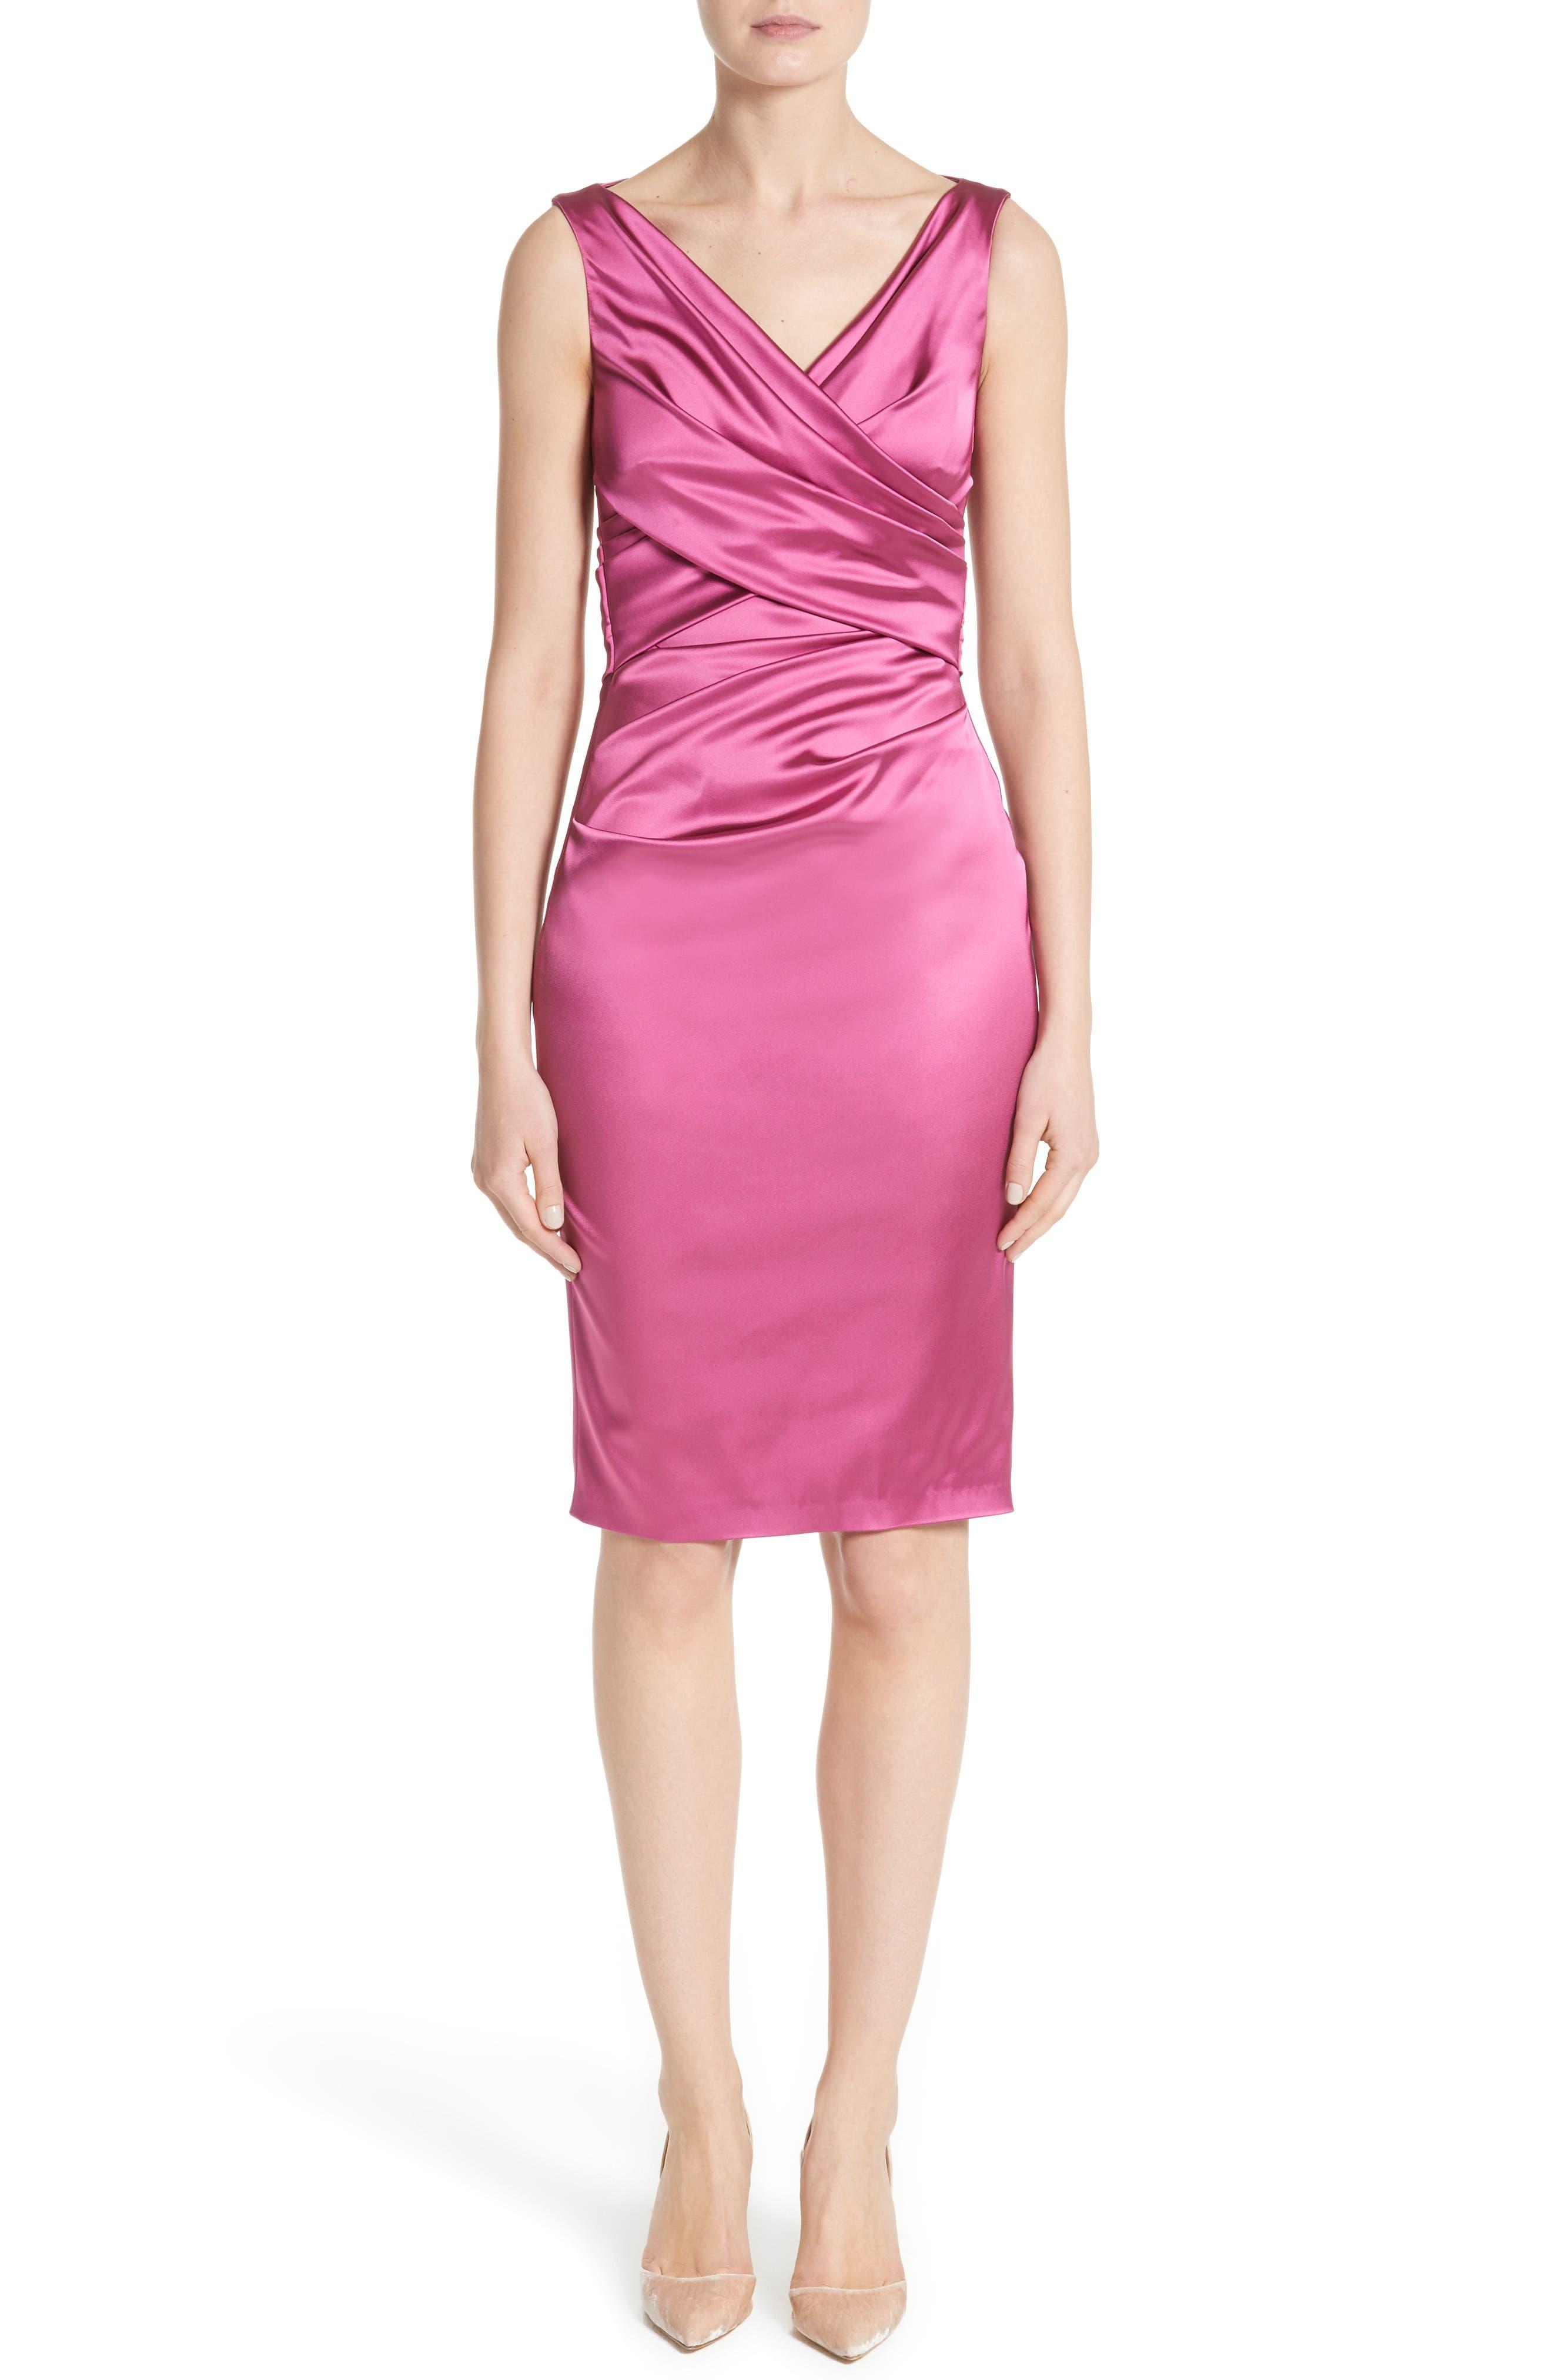 TALBOT RUNHOF Pleat Wrap Stretch Satin Sheath Dress